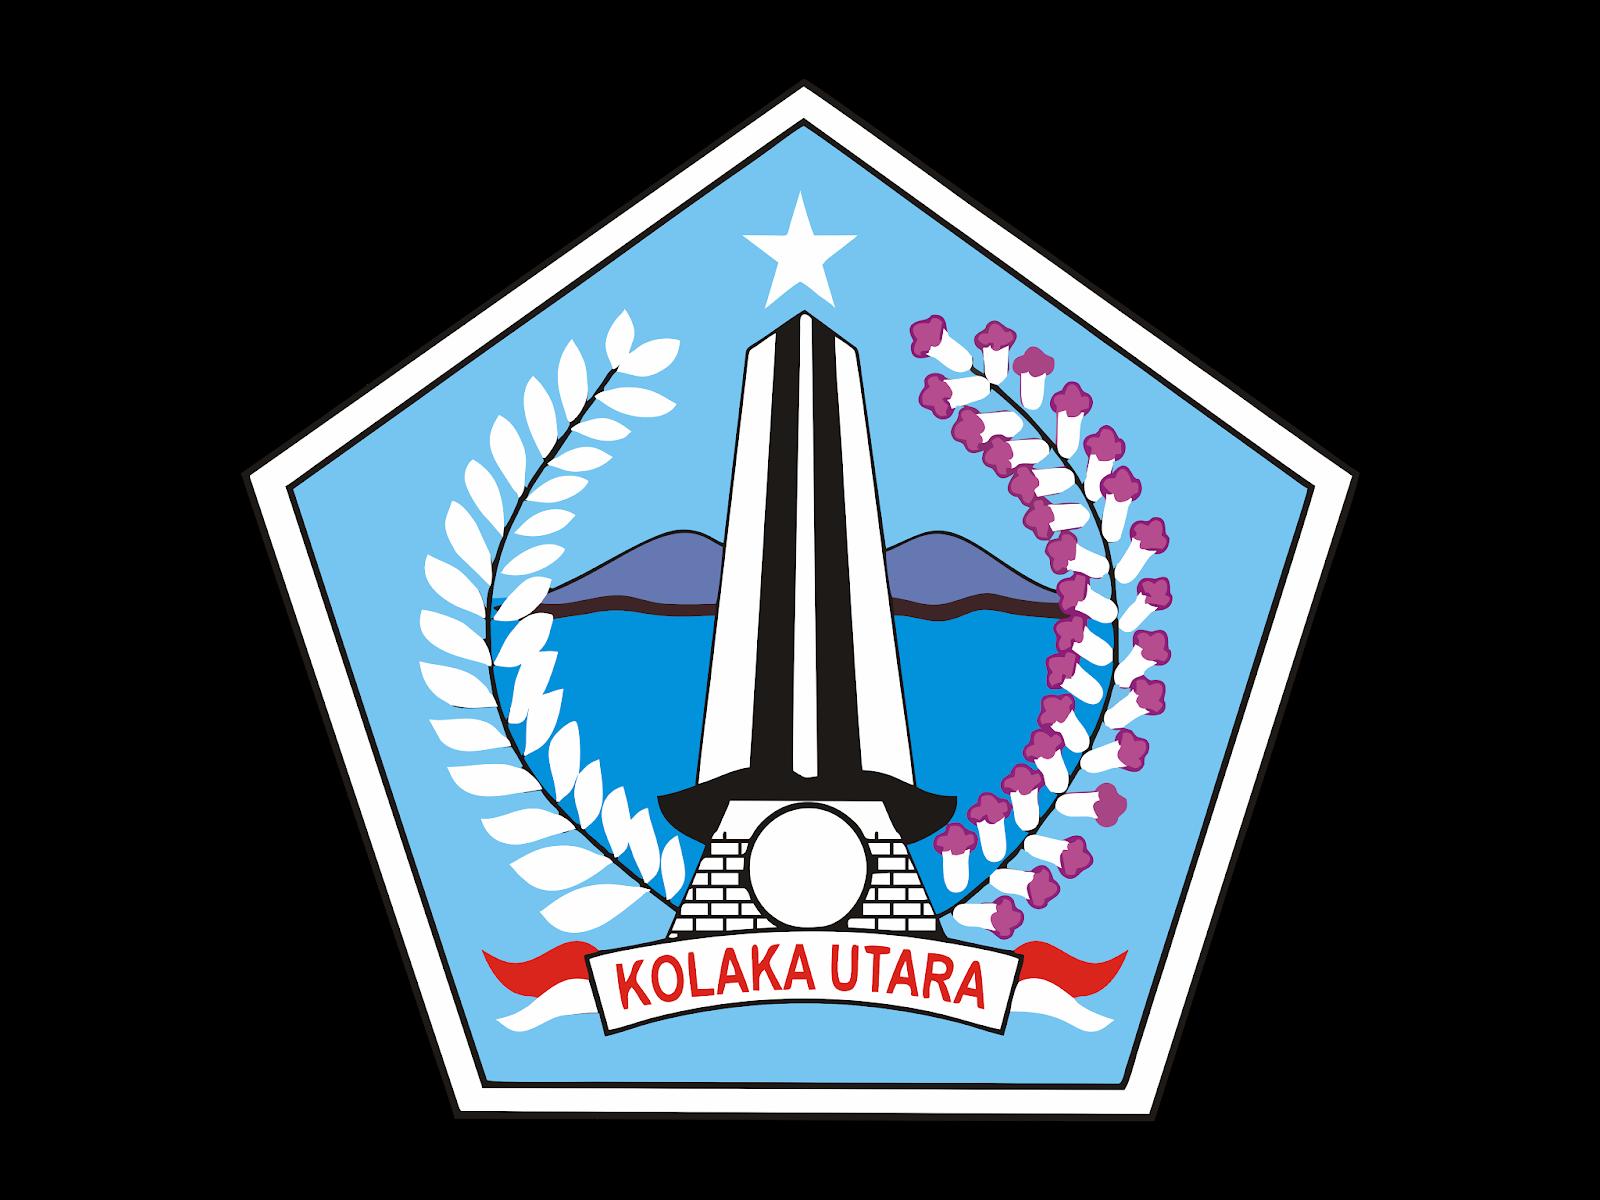 Logo Kabupaten Kolaka Utara Vector Cdr Png Hd Biologizone